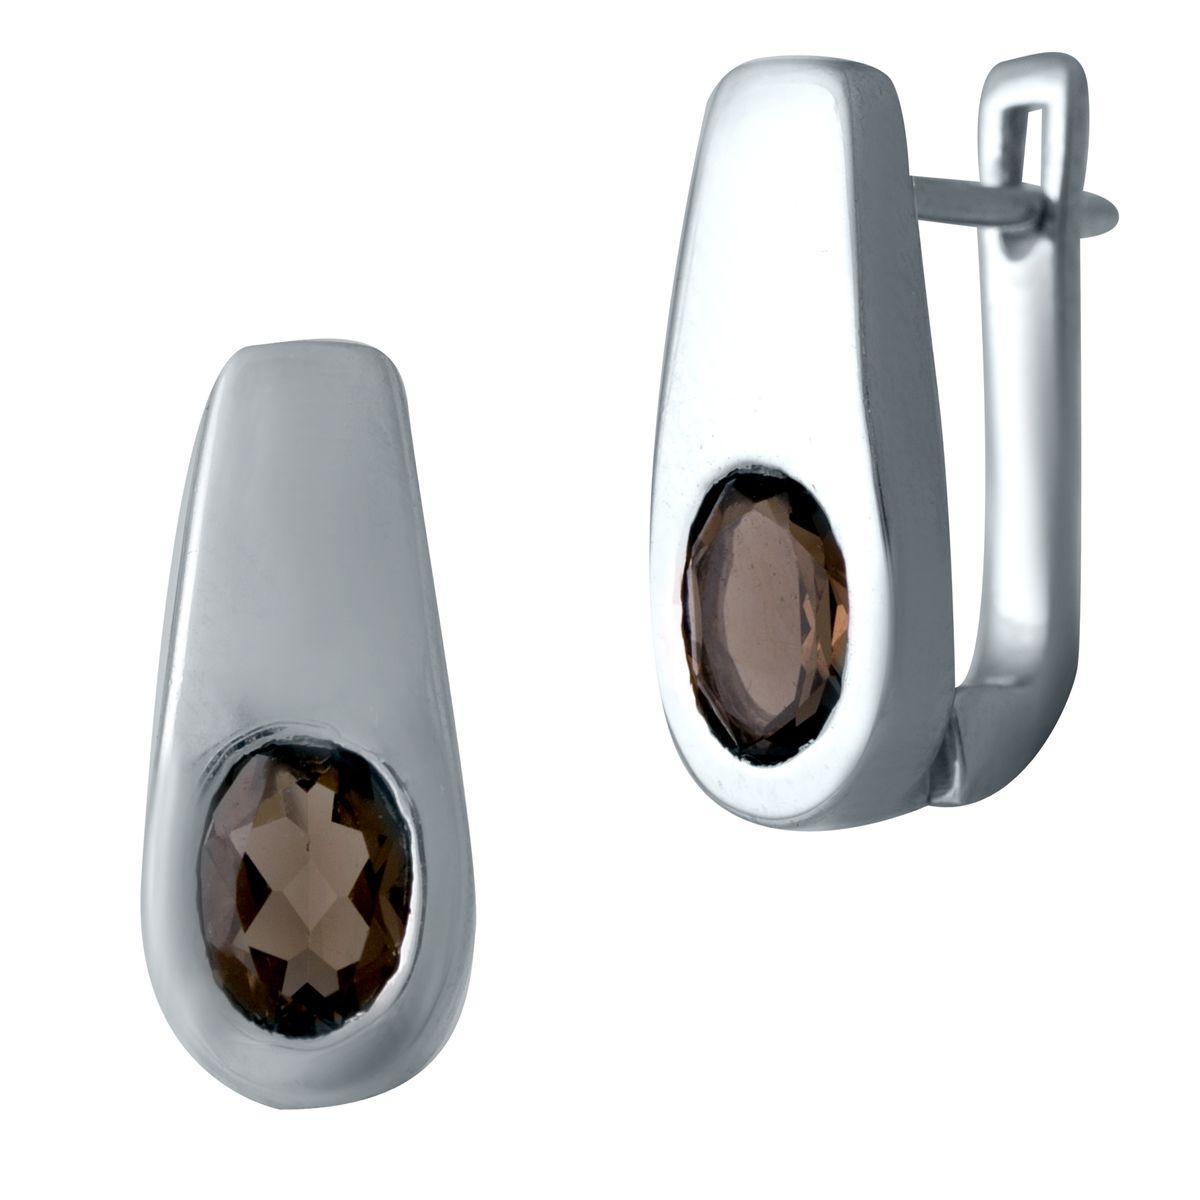 Серебряные серьги DreamJewelry с натуральным раухтопазом (дымчатым кварцем) (2033448)